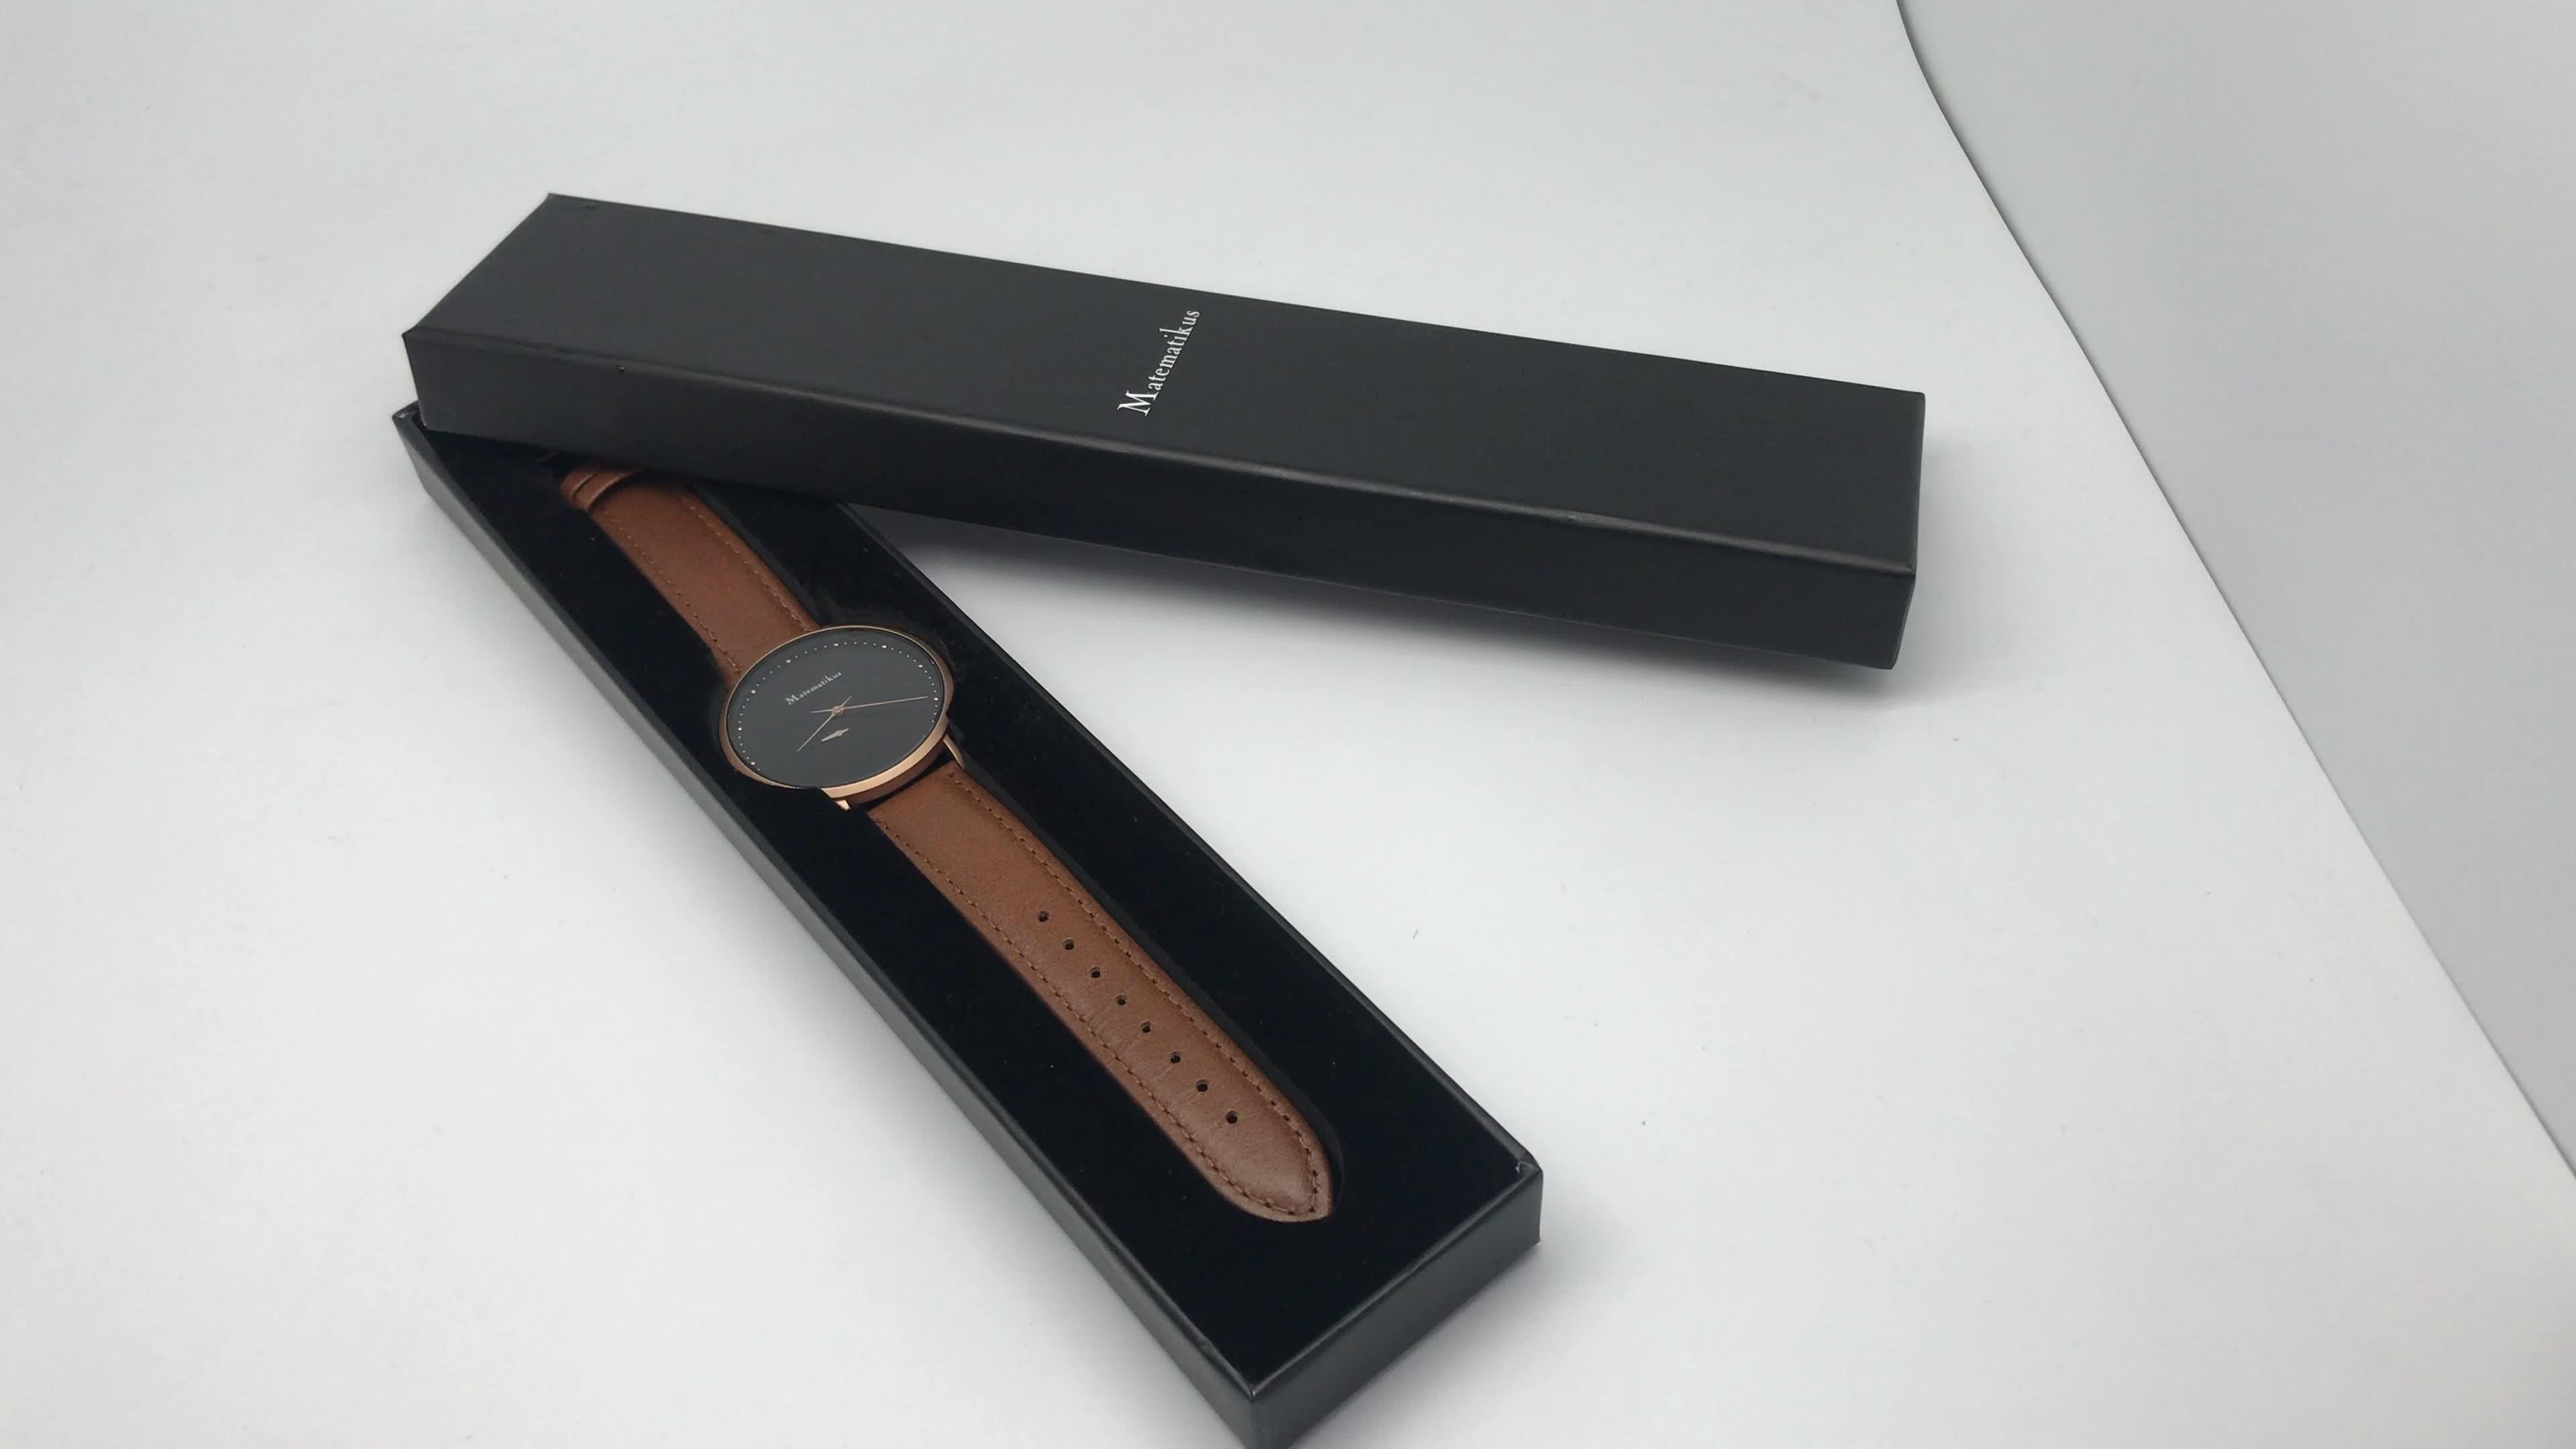 2019 Hot Sale Luxury Men Watch OEM Watch Quartz wristwatch with Luxury Box Prefect Gifts Leather Watch for Men